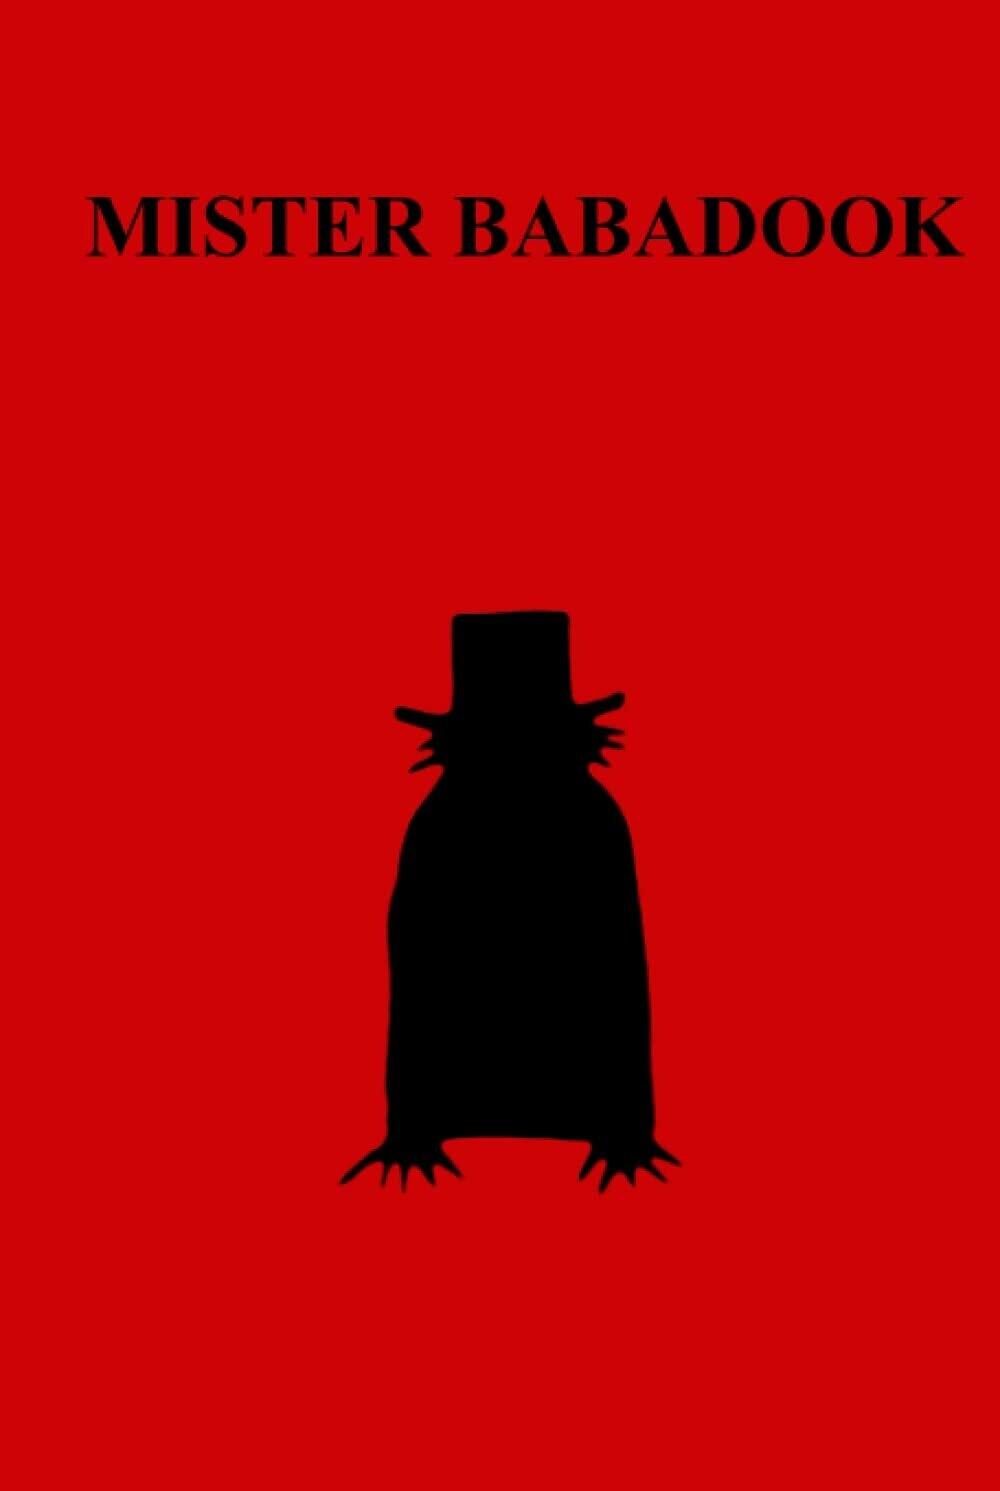 Mister Babadook [Hardback] Book - Journal Diary Horror Movie Prop Replica